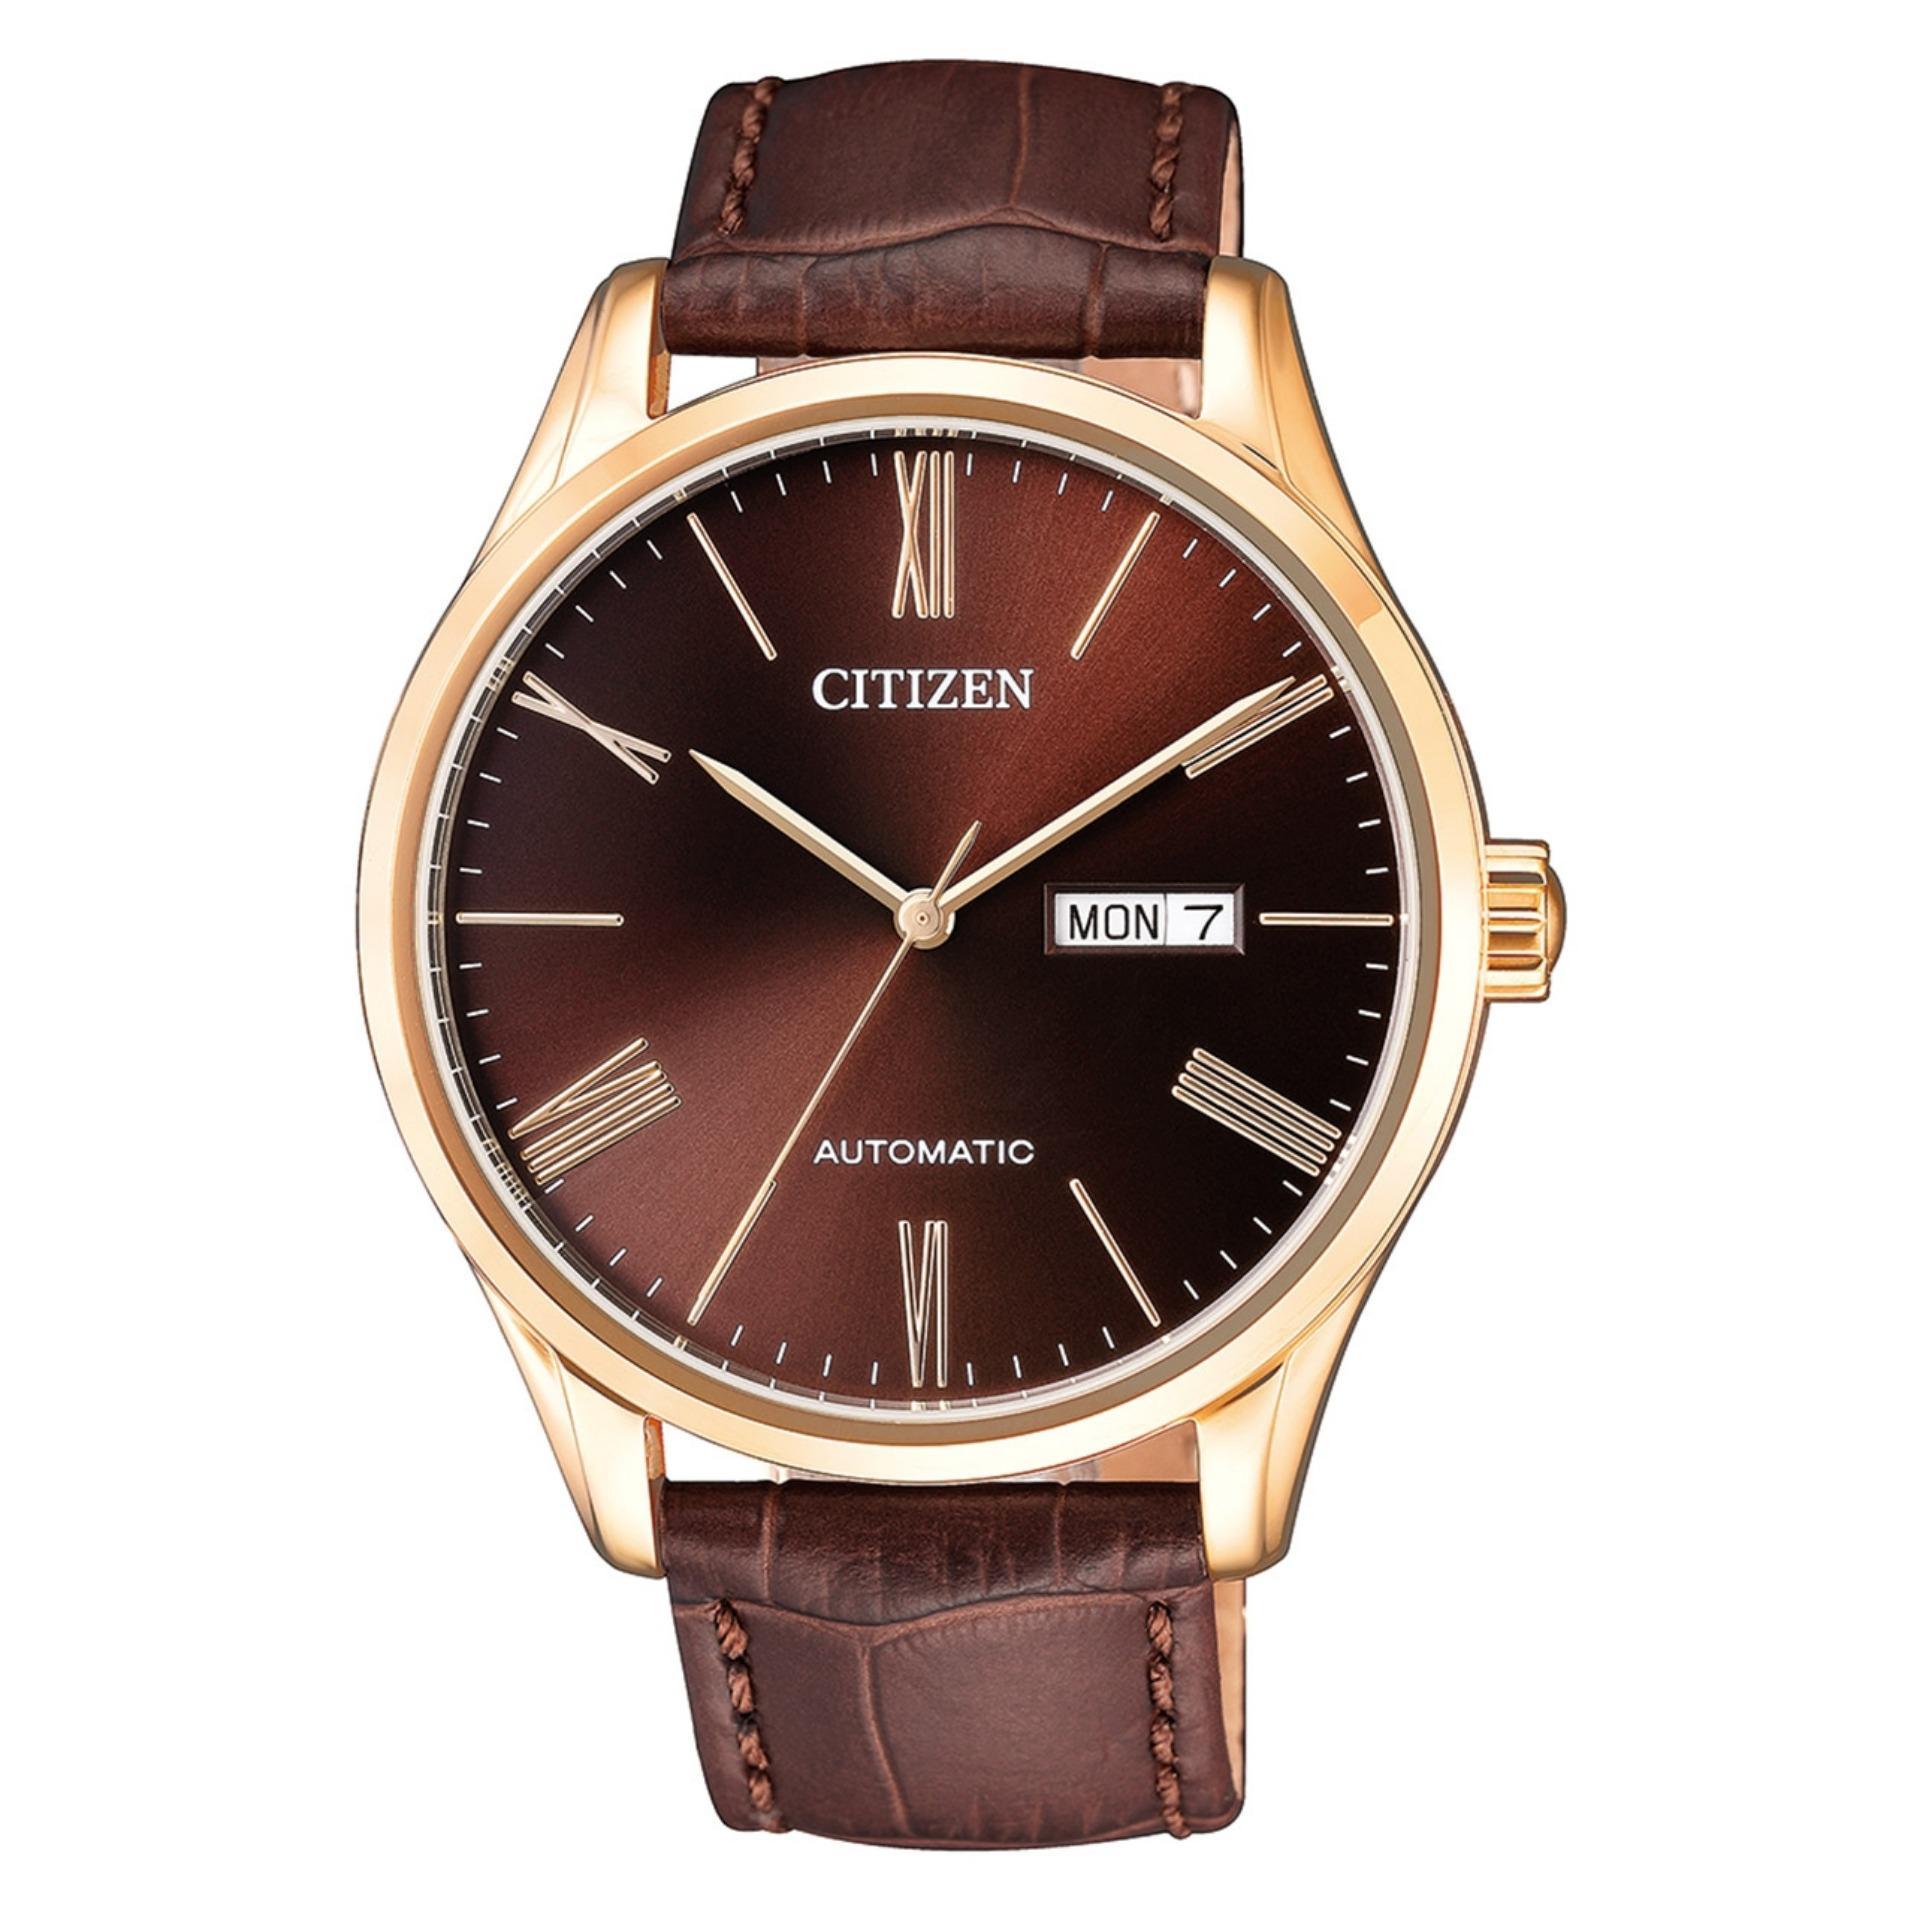 1278e0d8649 ขาย Citizen Watches - ซื้อ Watches พร้อมส่วนลด ดีลราคาถูก